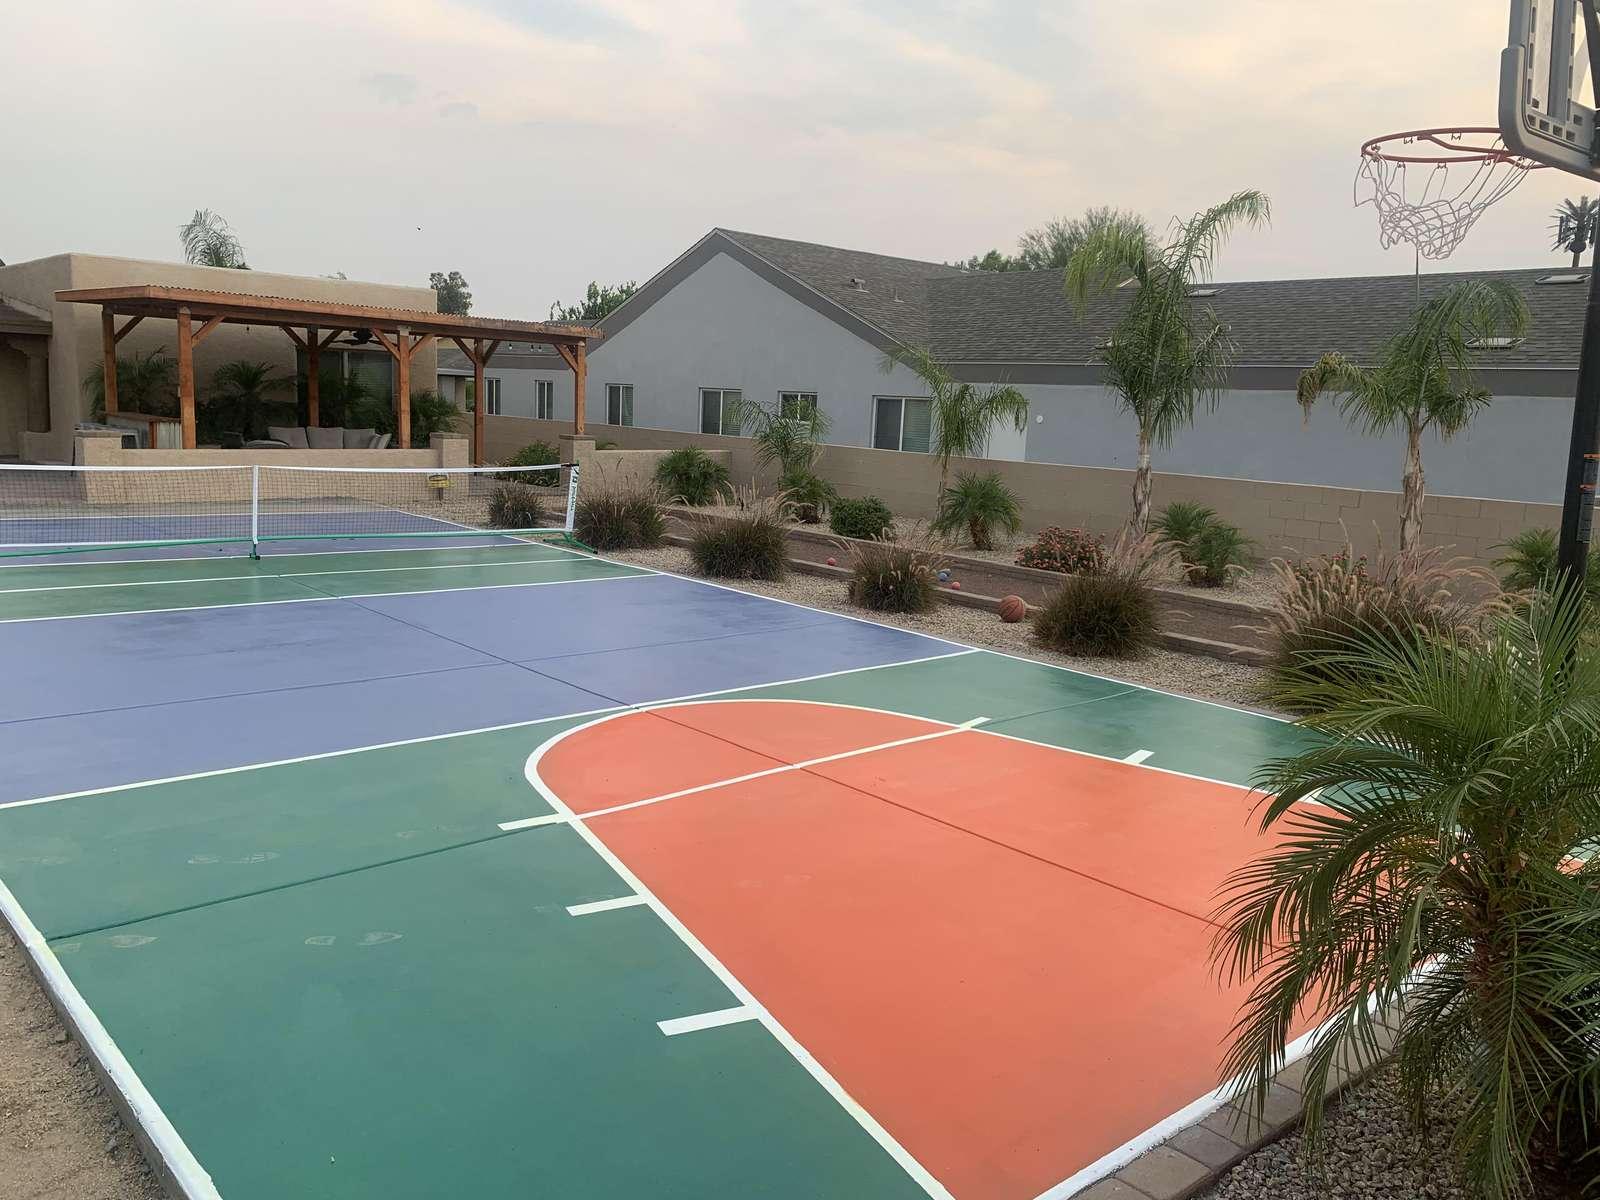 Brand New Basketball-Pickleball Sportscourt.